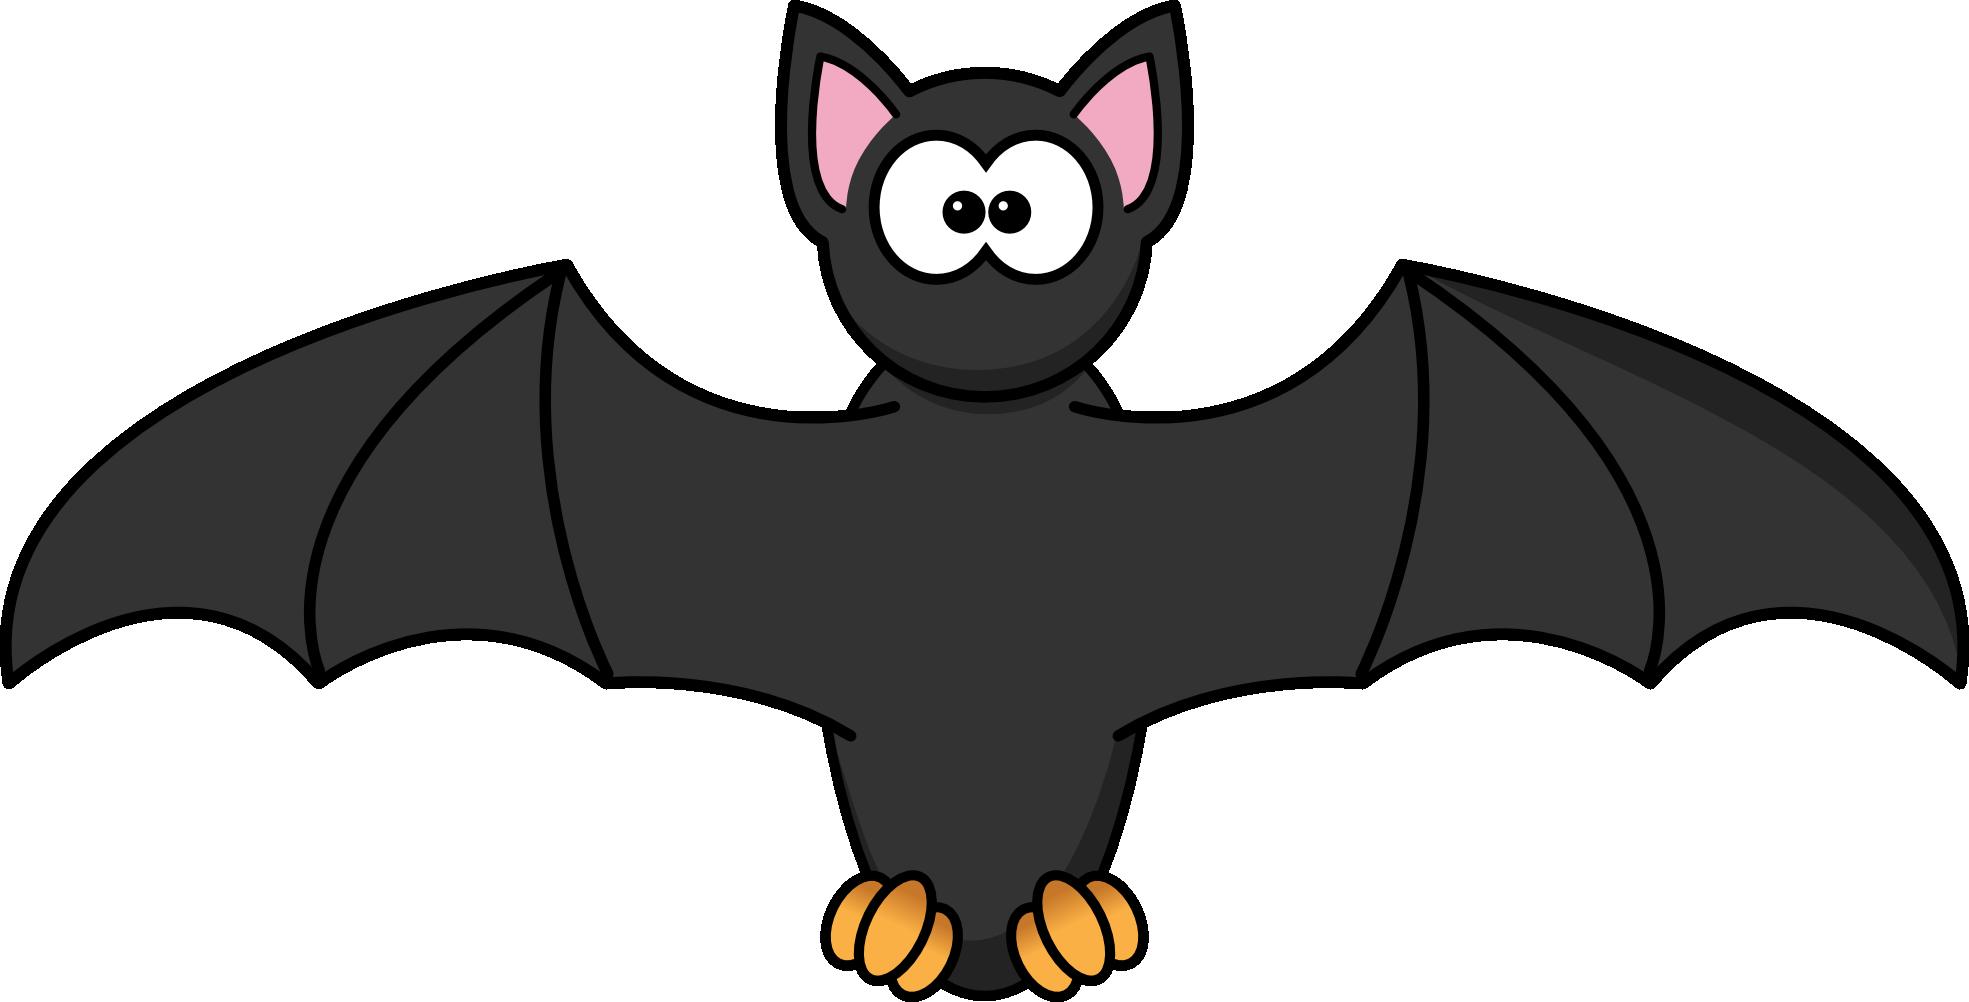 Panda free images batclipart. Bat clipart